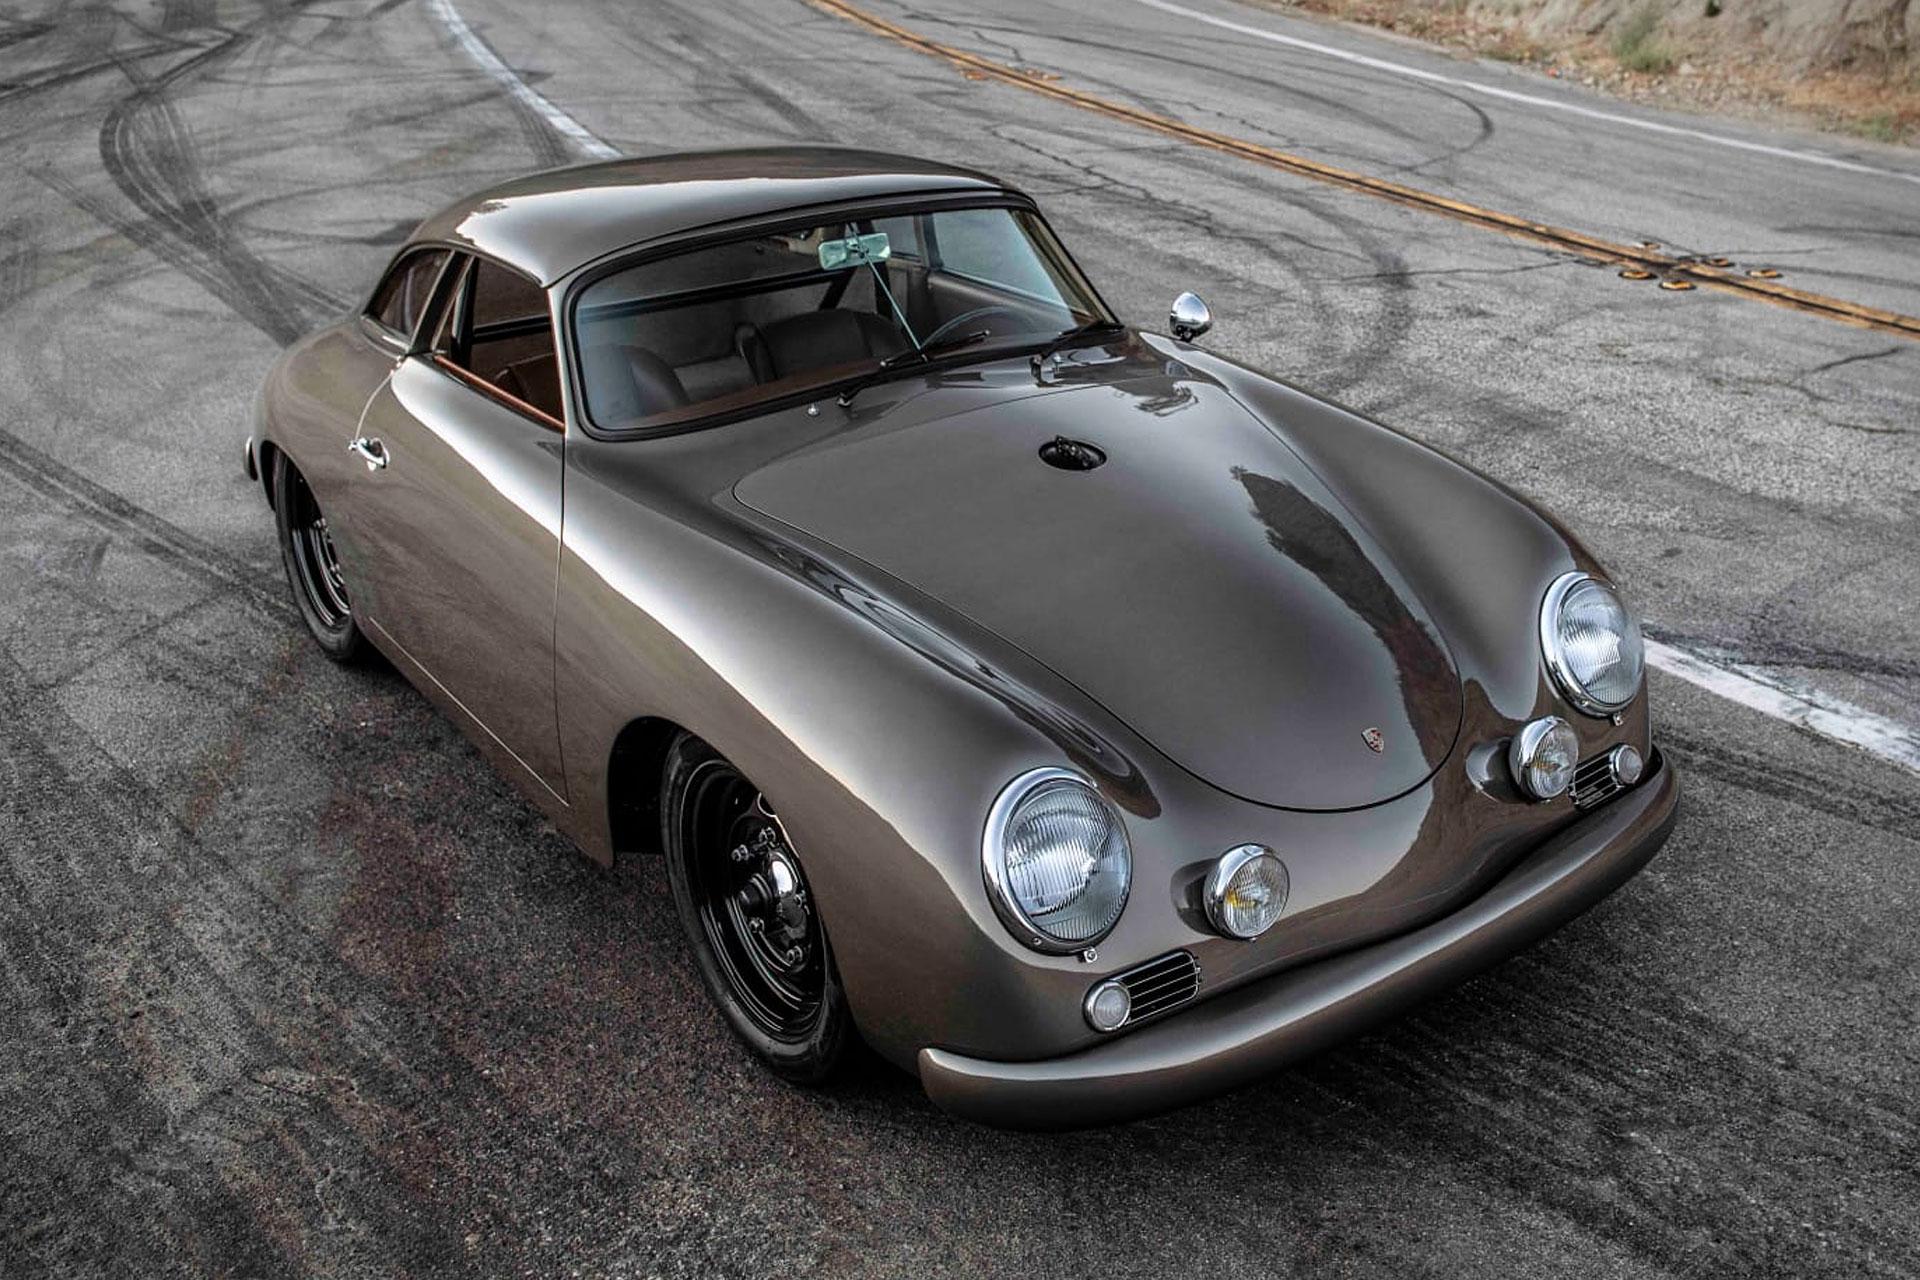 John Oates' 1960 Porsche 356 Coupe